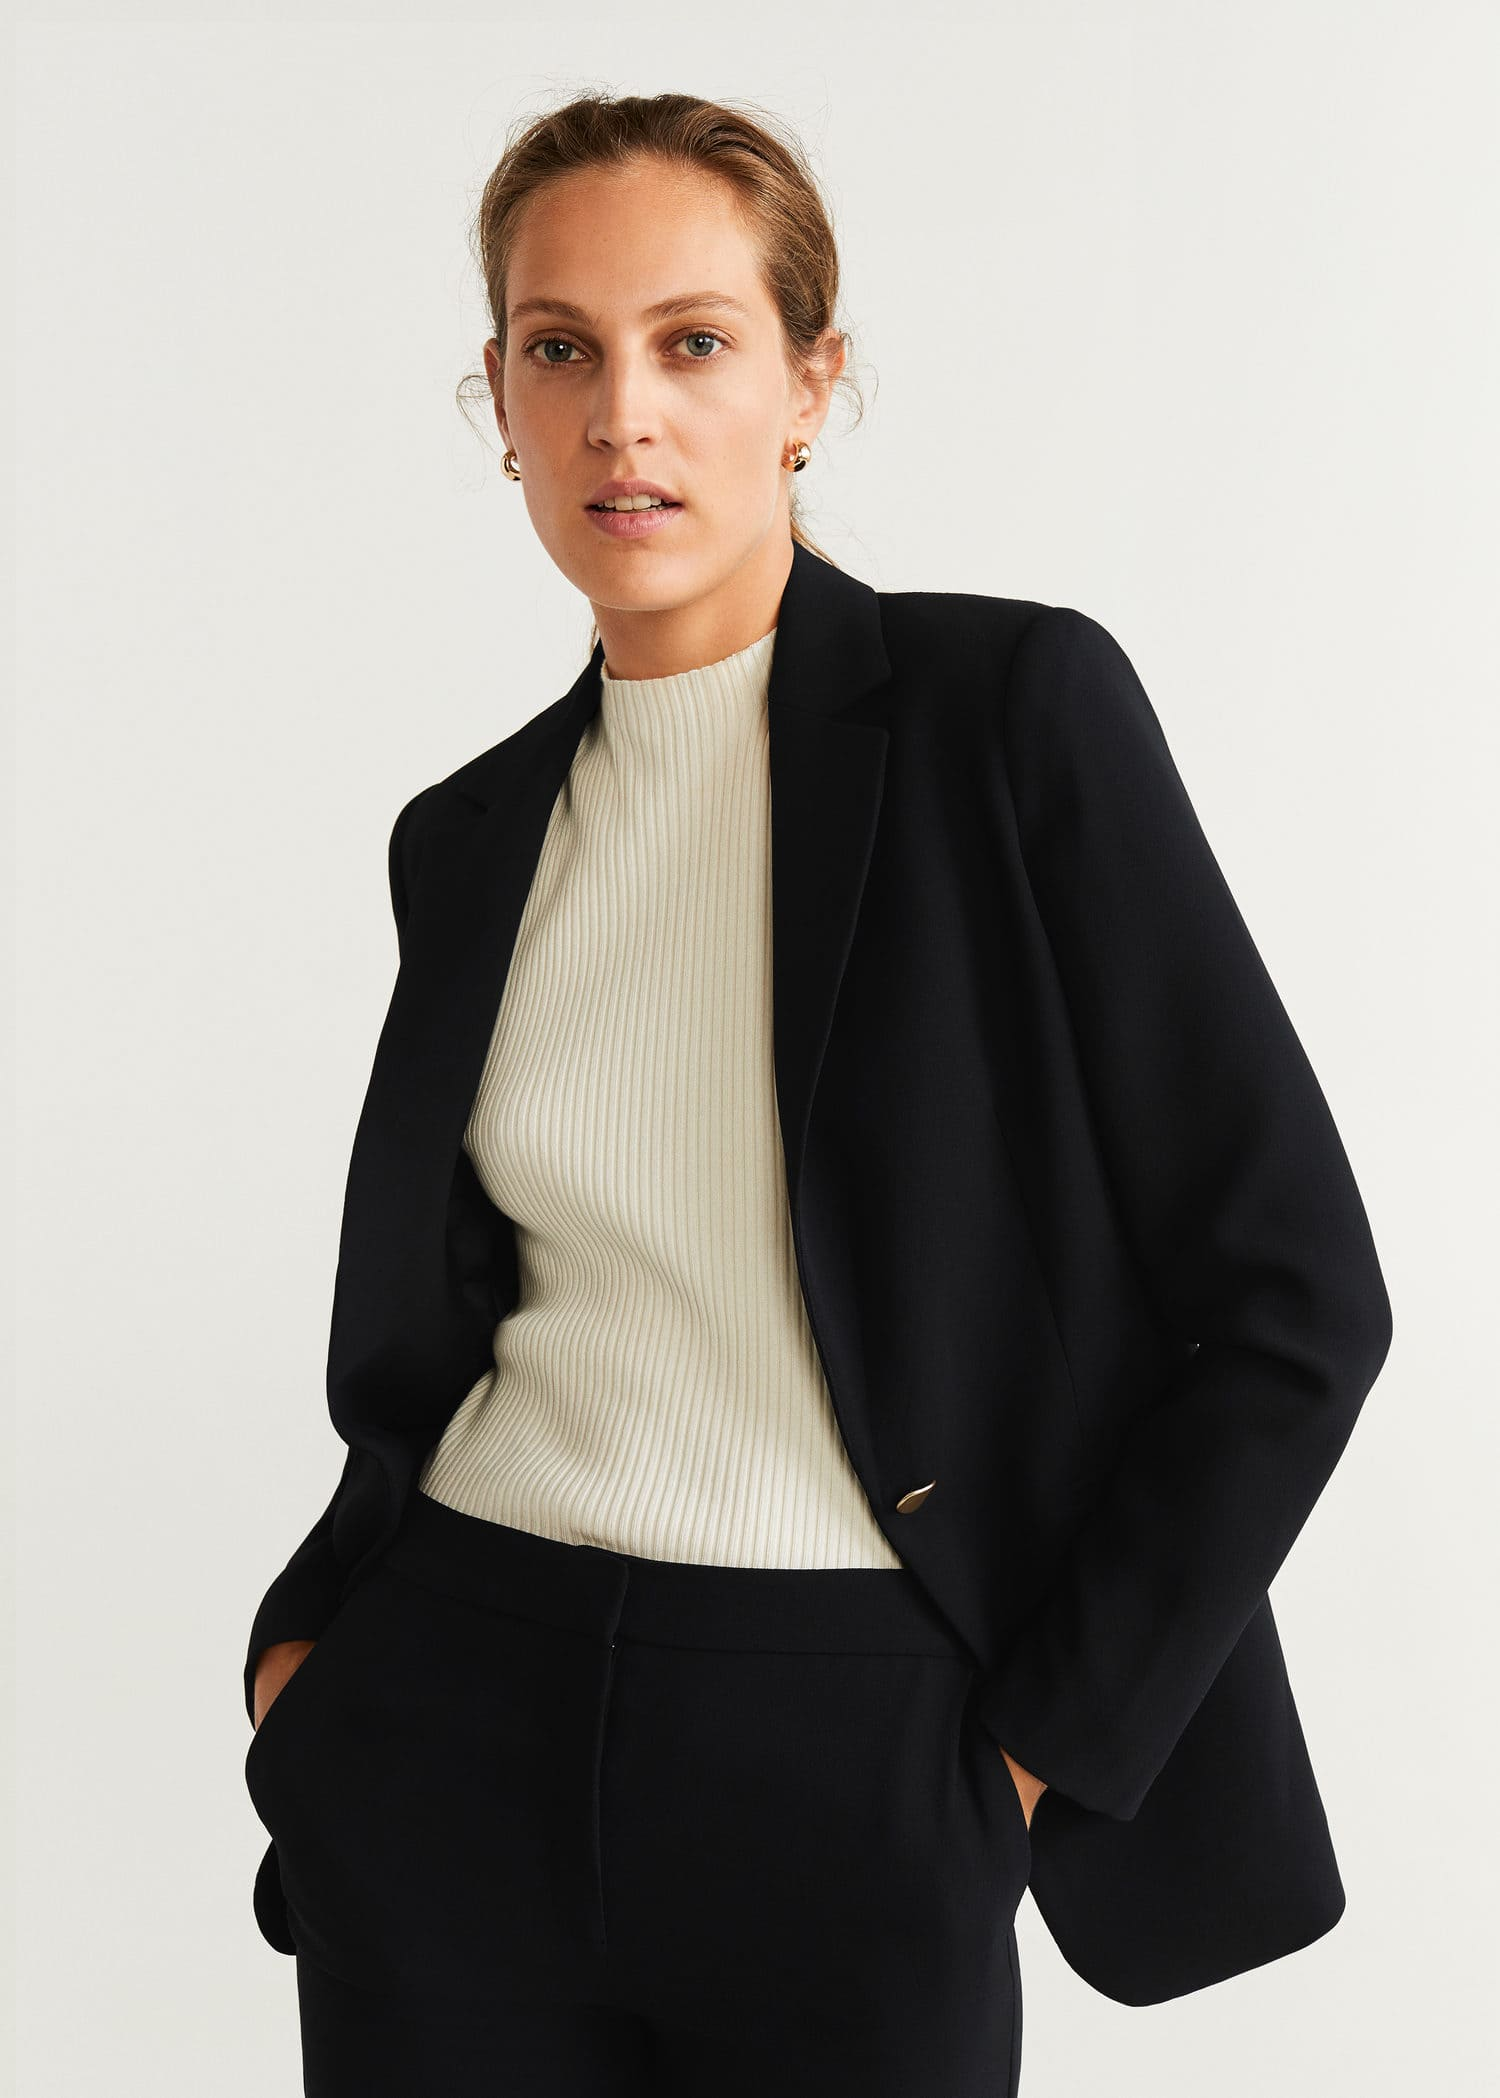 Veste costume poches Femme   Mango France